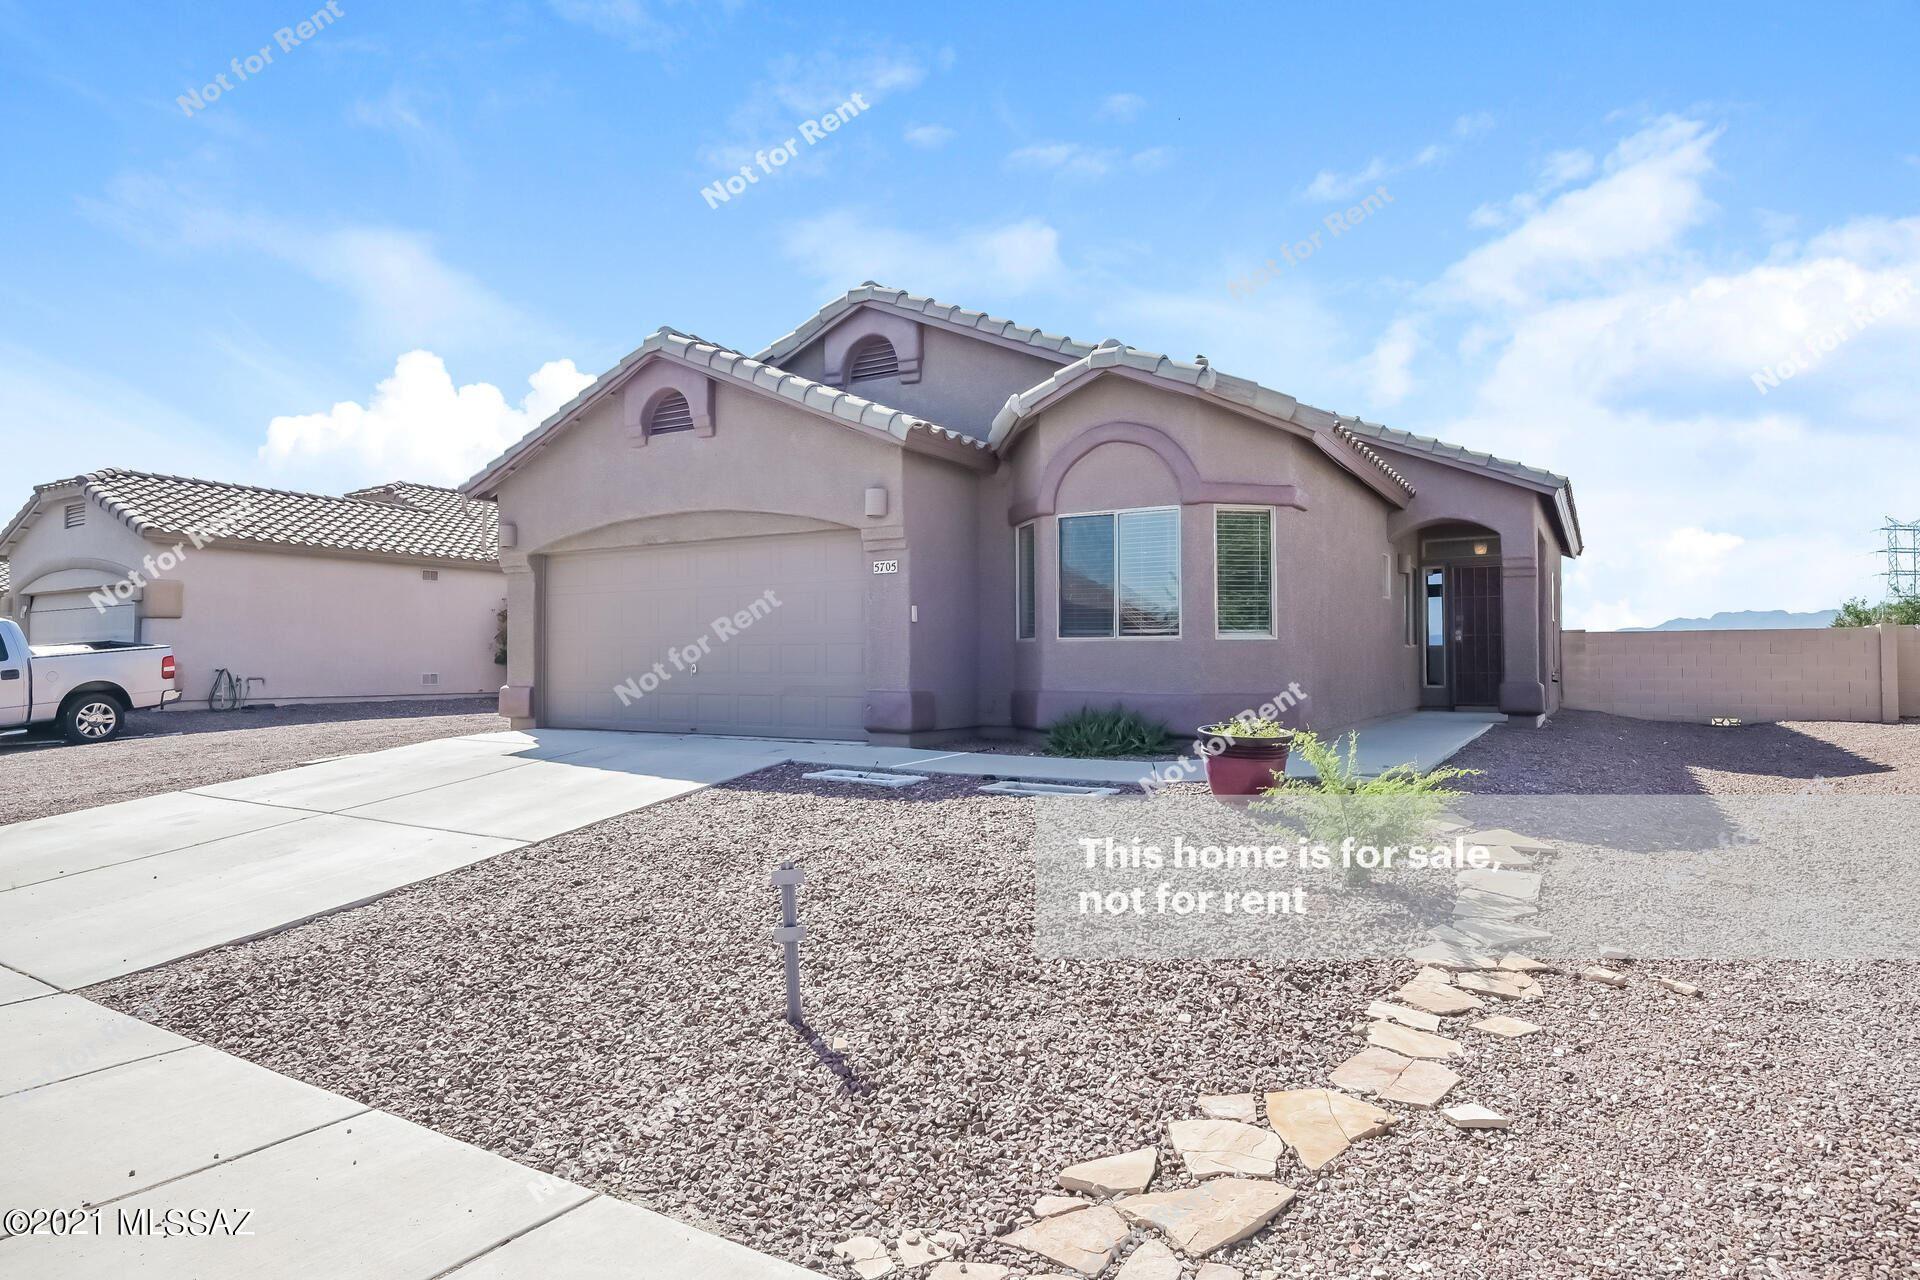 5705 W Cortaro Crossing Drive, Tucson, AZ 85742 - MLS#: 22123526